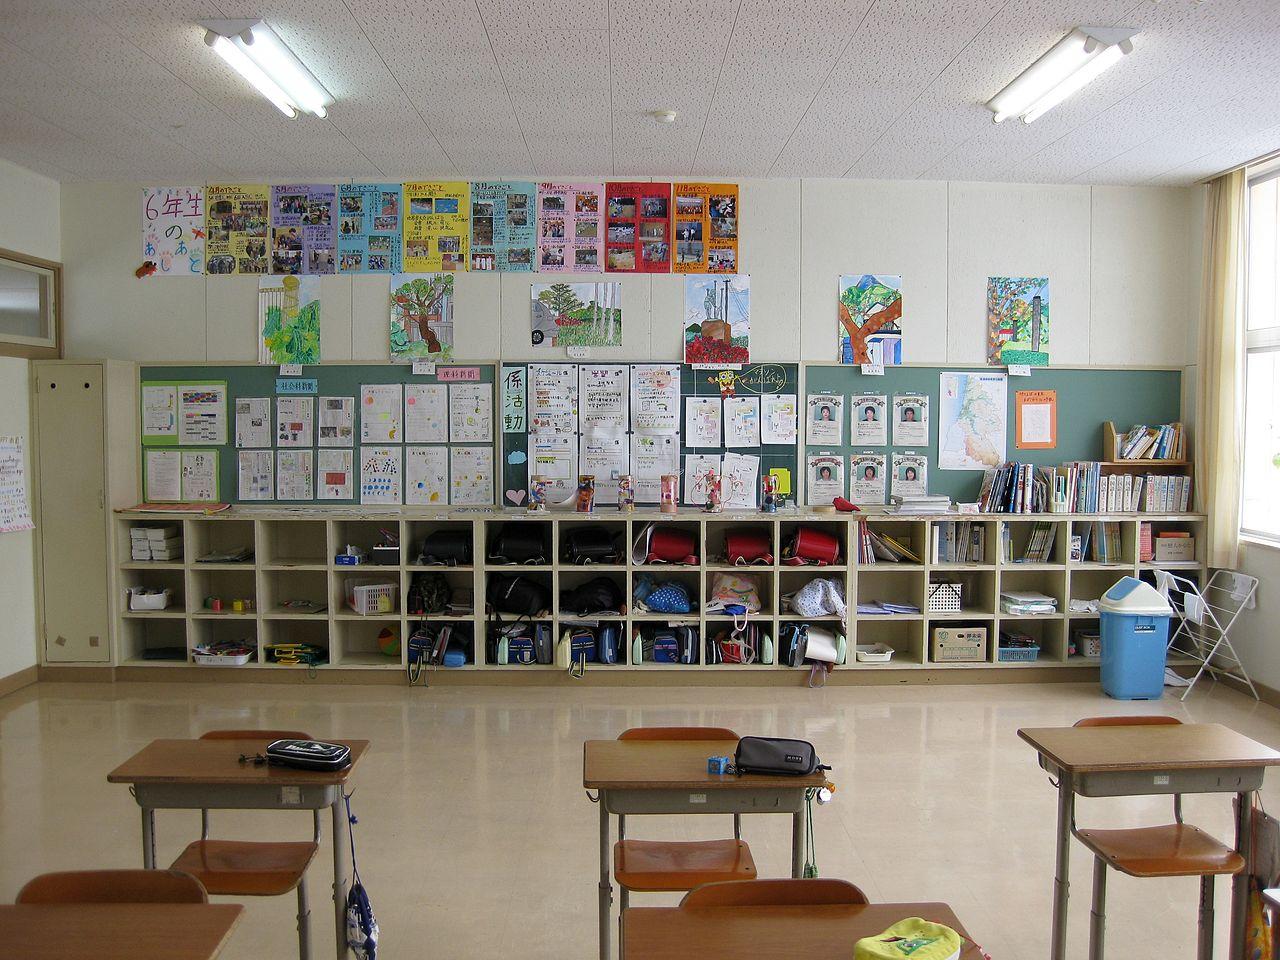 Elementary School Classrooms ~ File hitane elementary school classroom g wikimedia